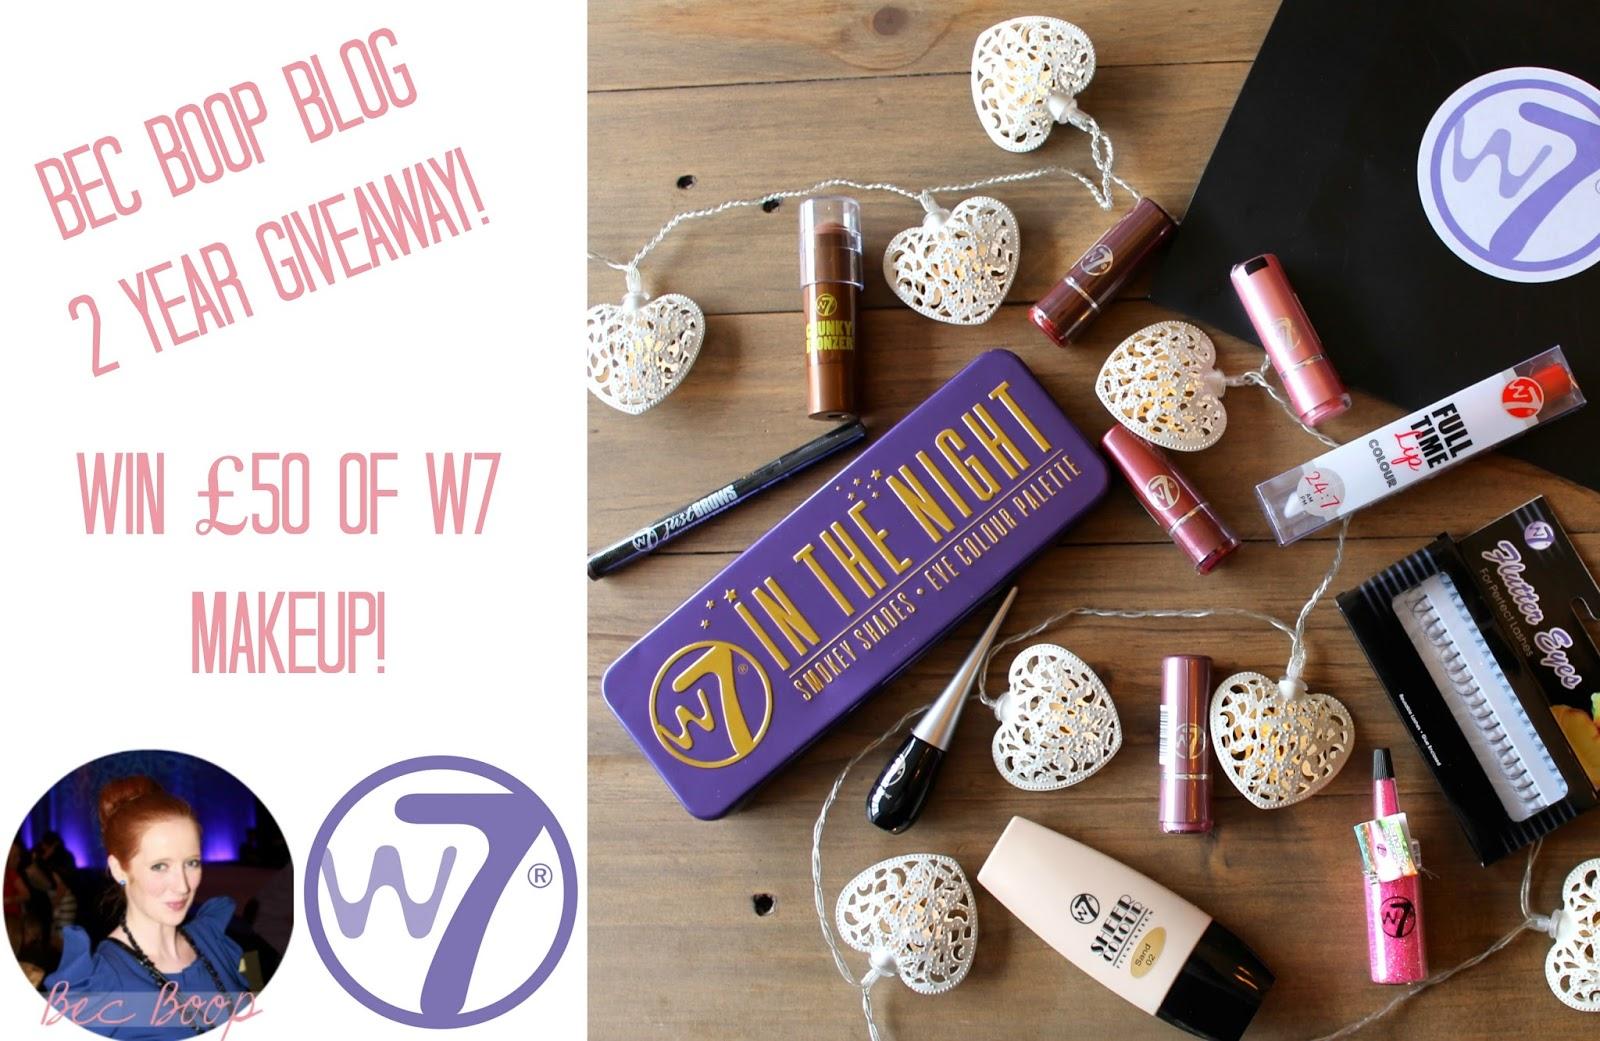 Bec Boop 2 year giveaway w7 makeup